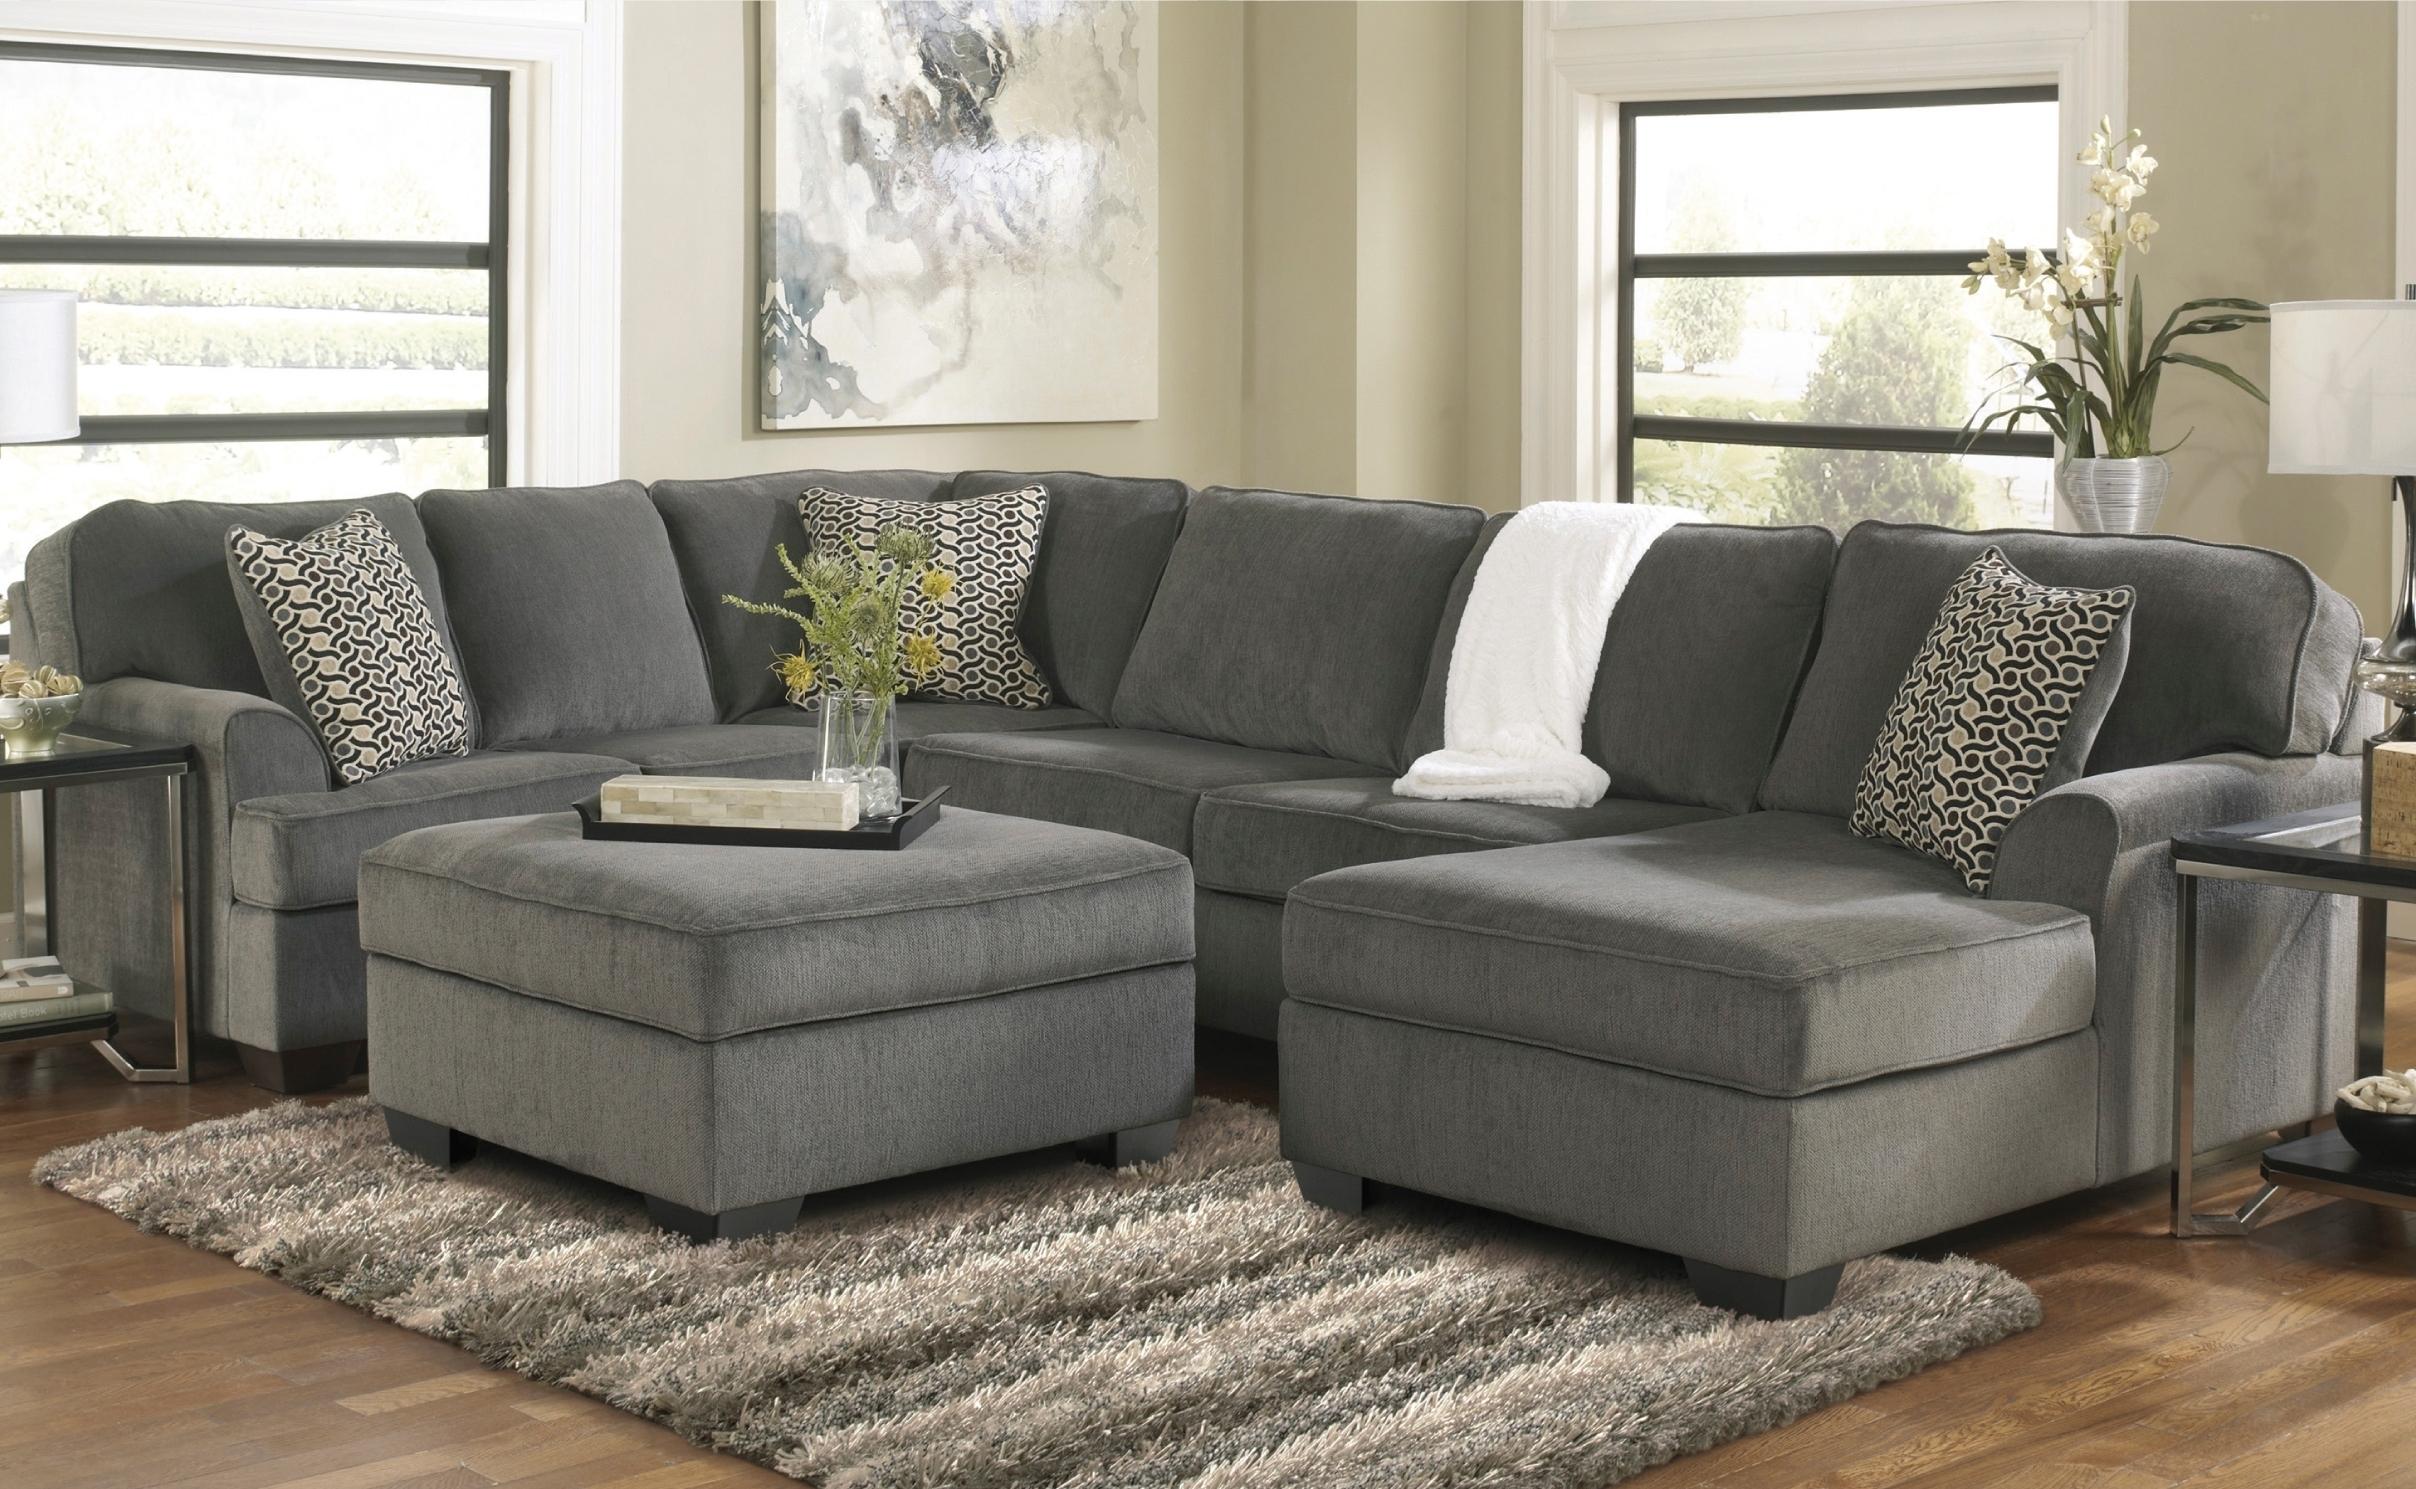 Leather Sectional Sofas Raleigh Nc | Ezhandui inside Raleigh Sectional Sofas (Image 8 of 10)